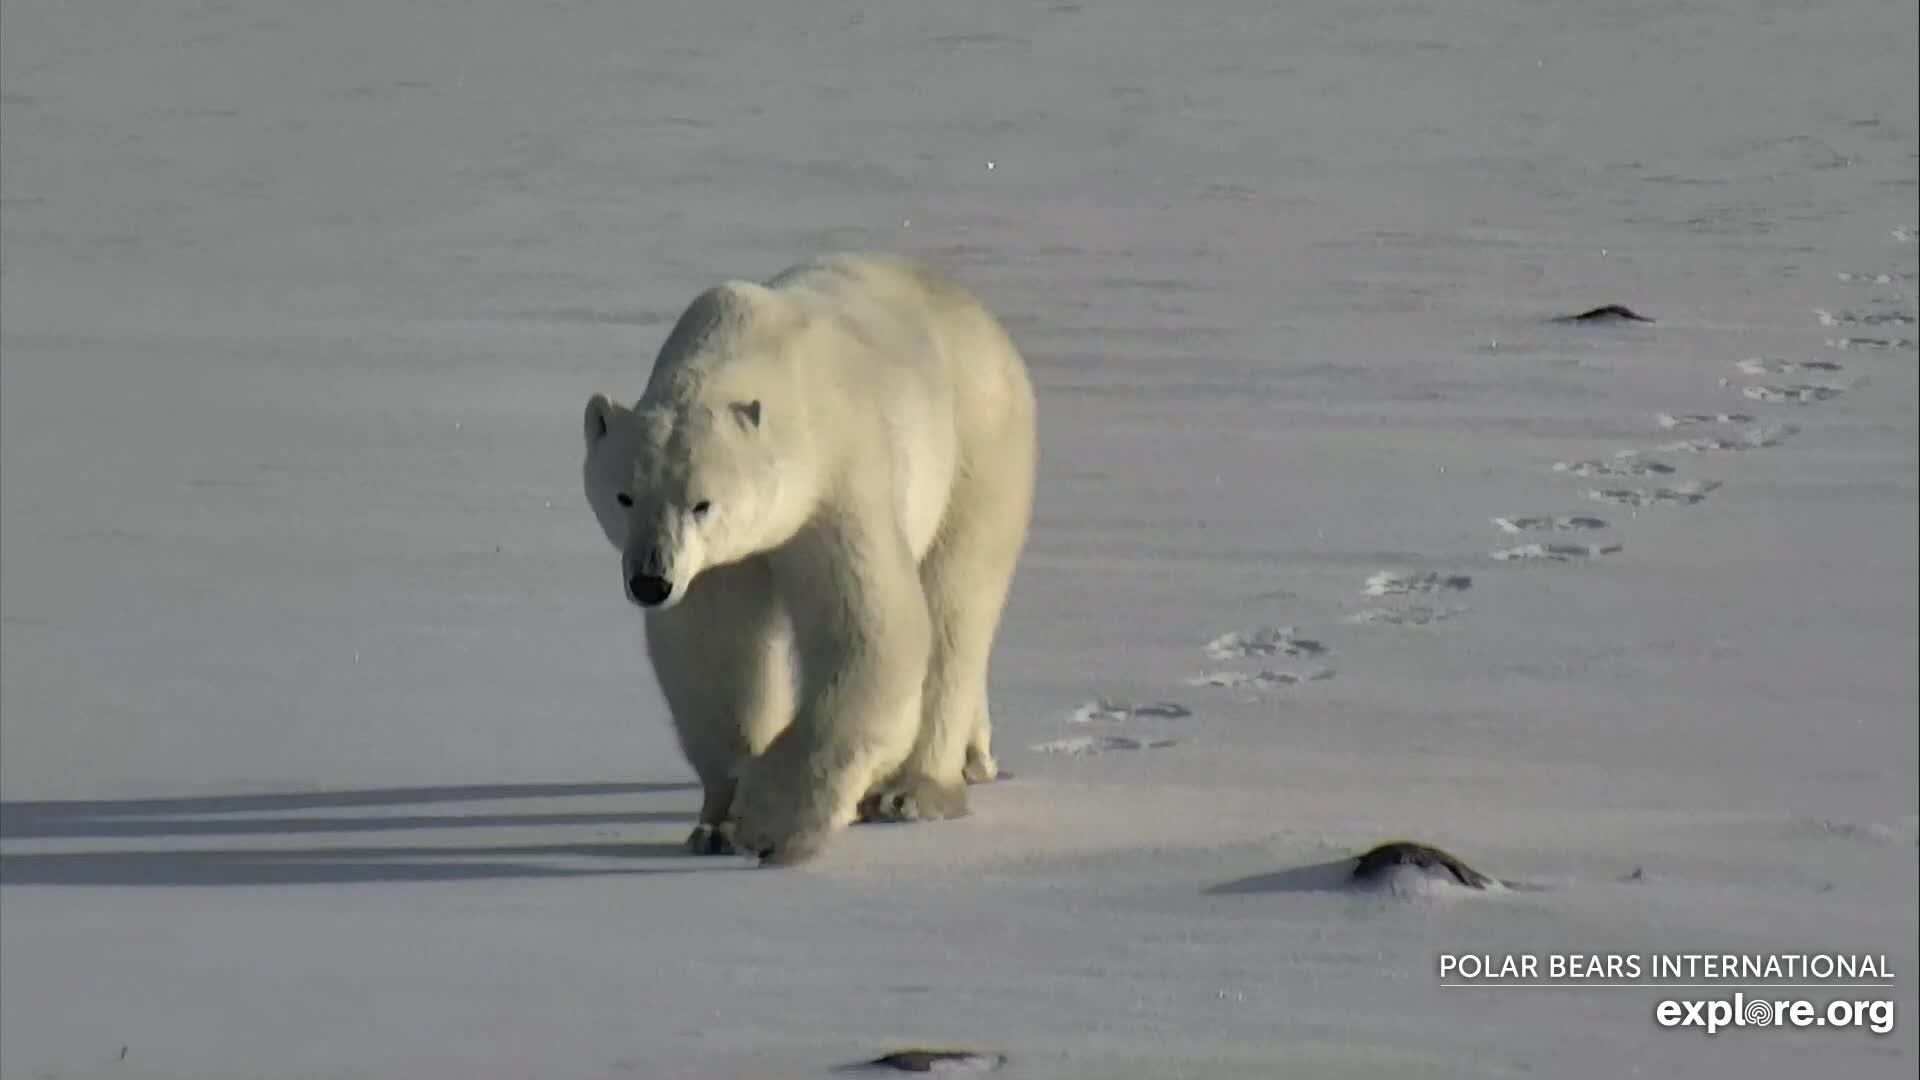 PolarBears_CamOp Arya_11.1.19